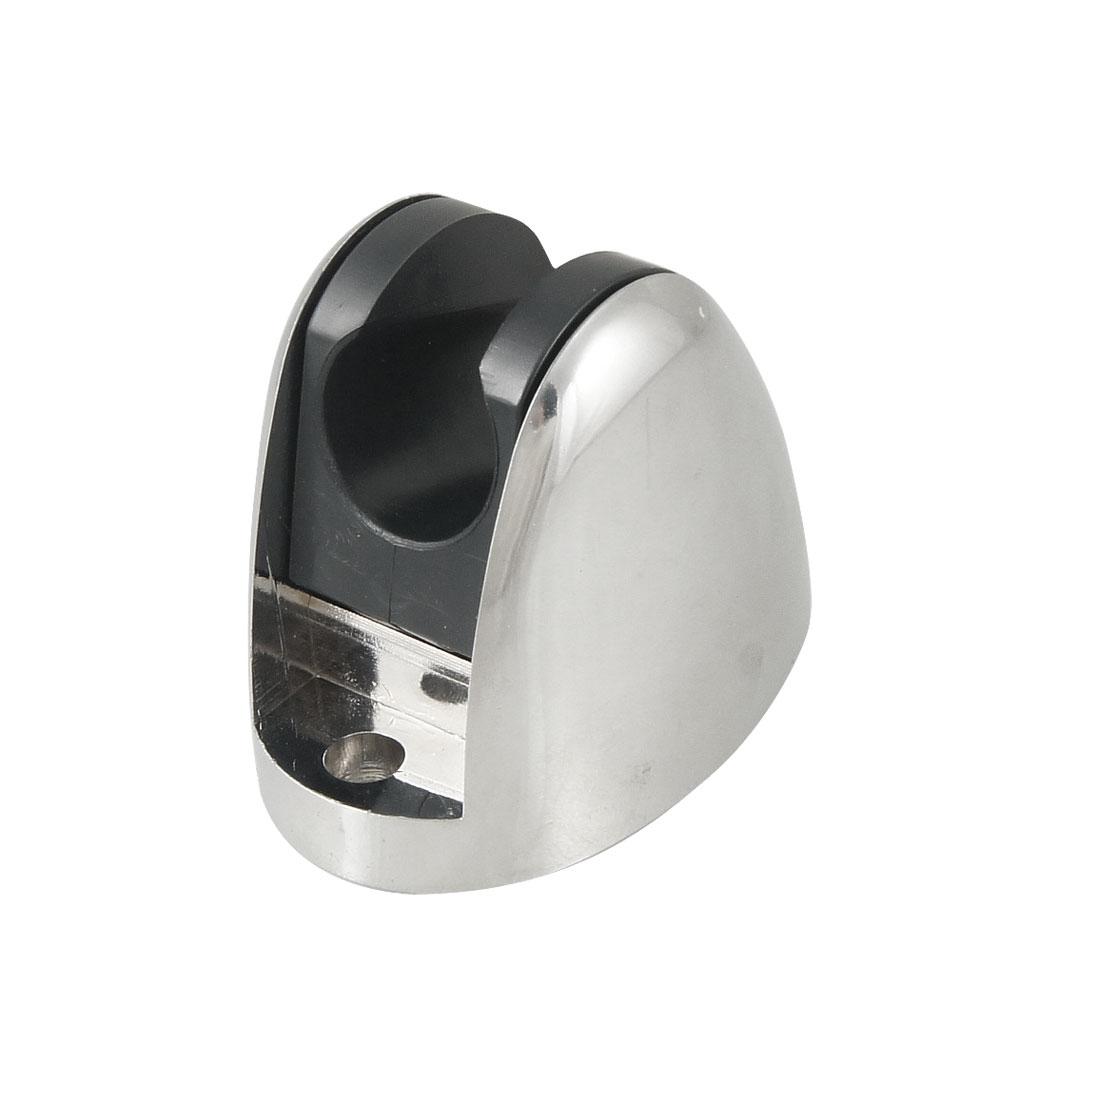 Silver Tone Black Plastic Bathroom Shower Head Holder Bracket